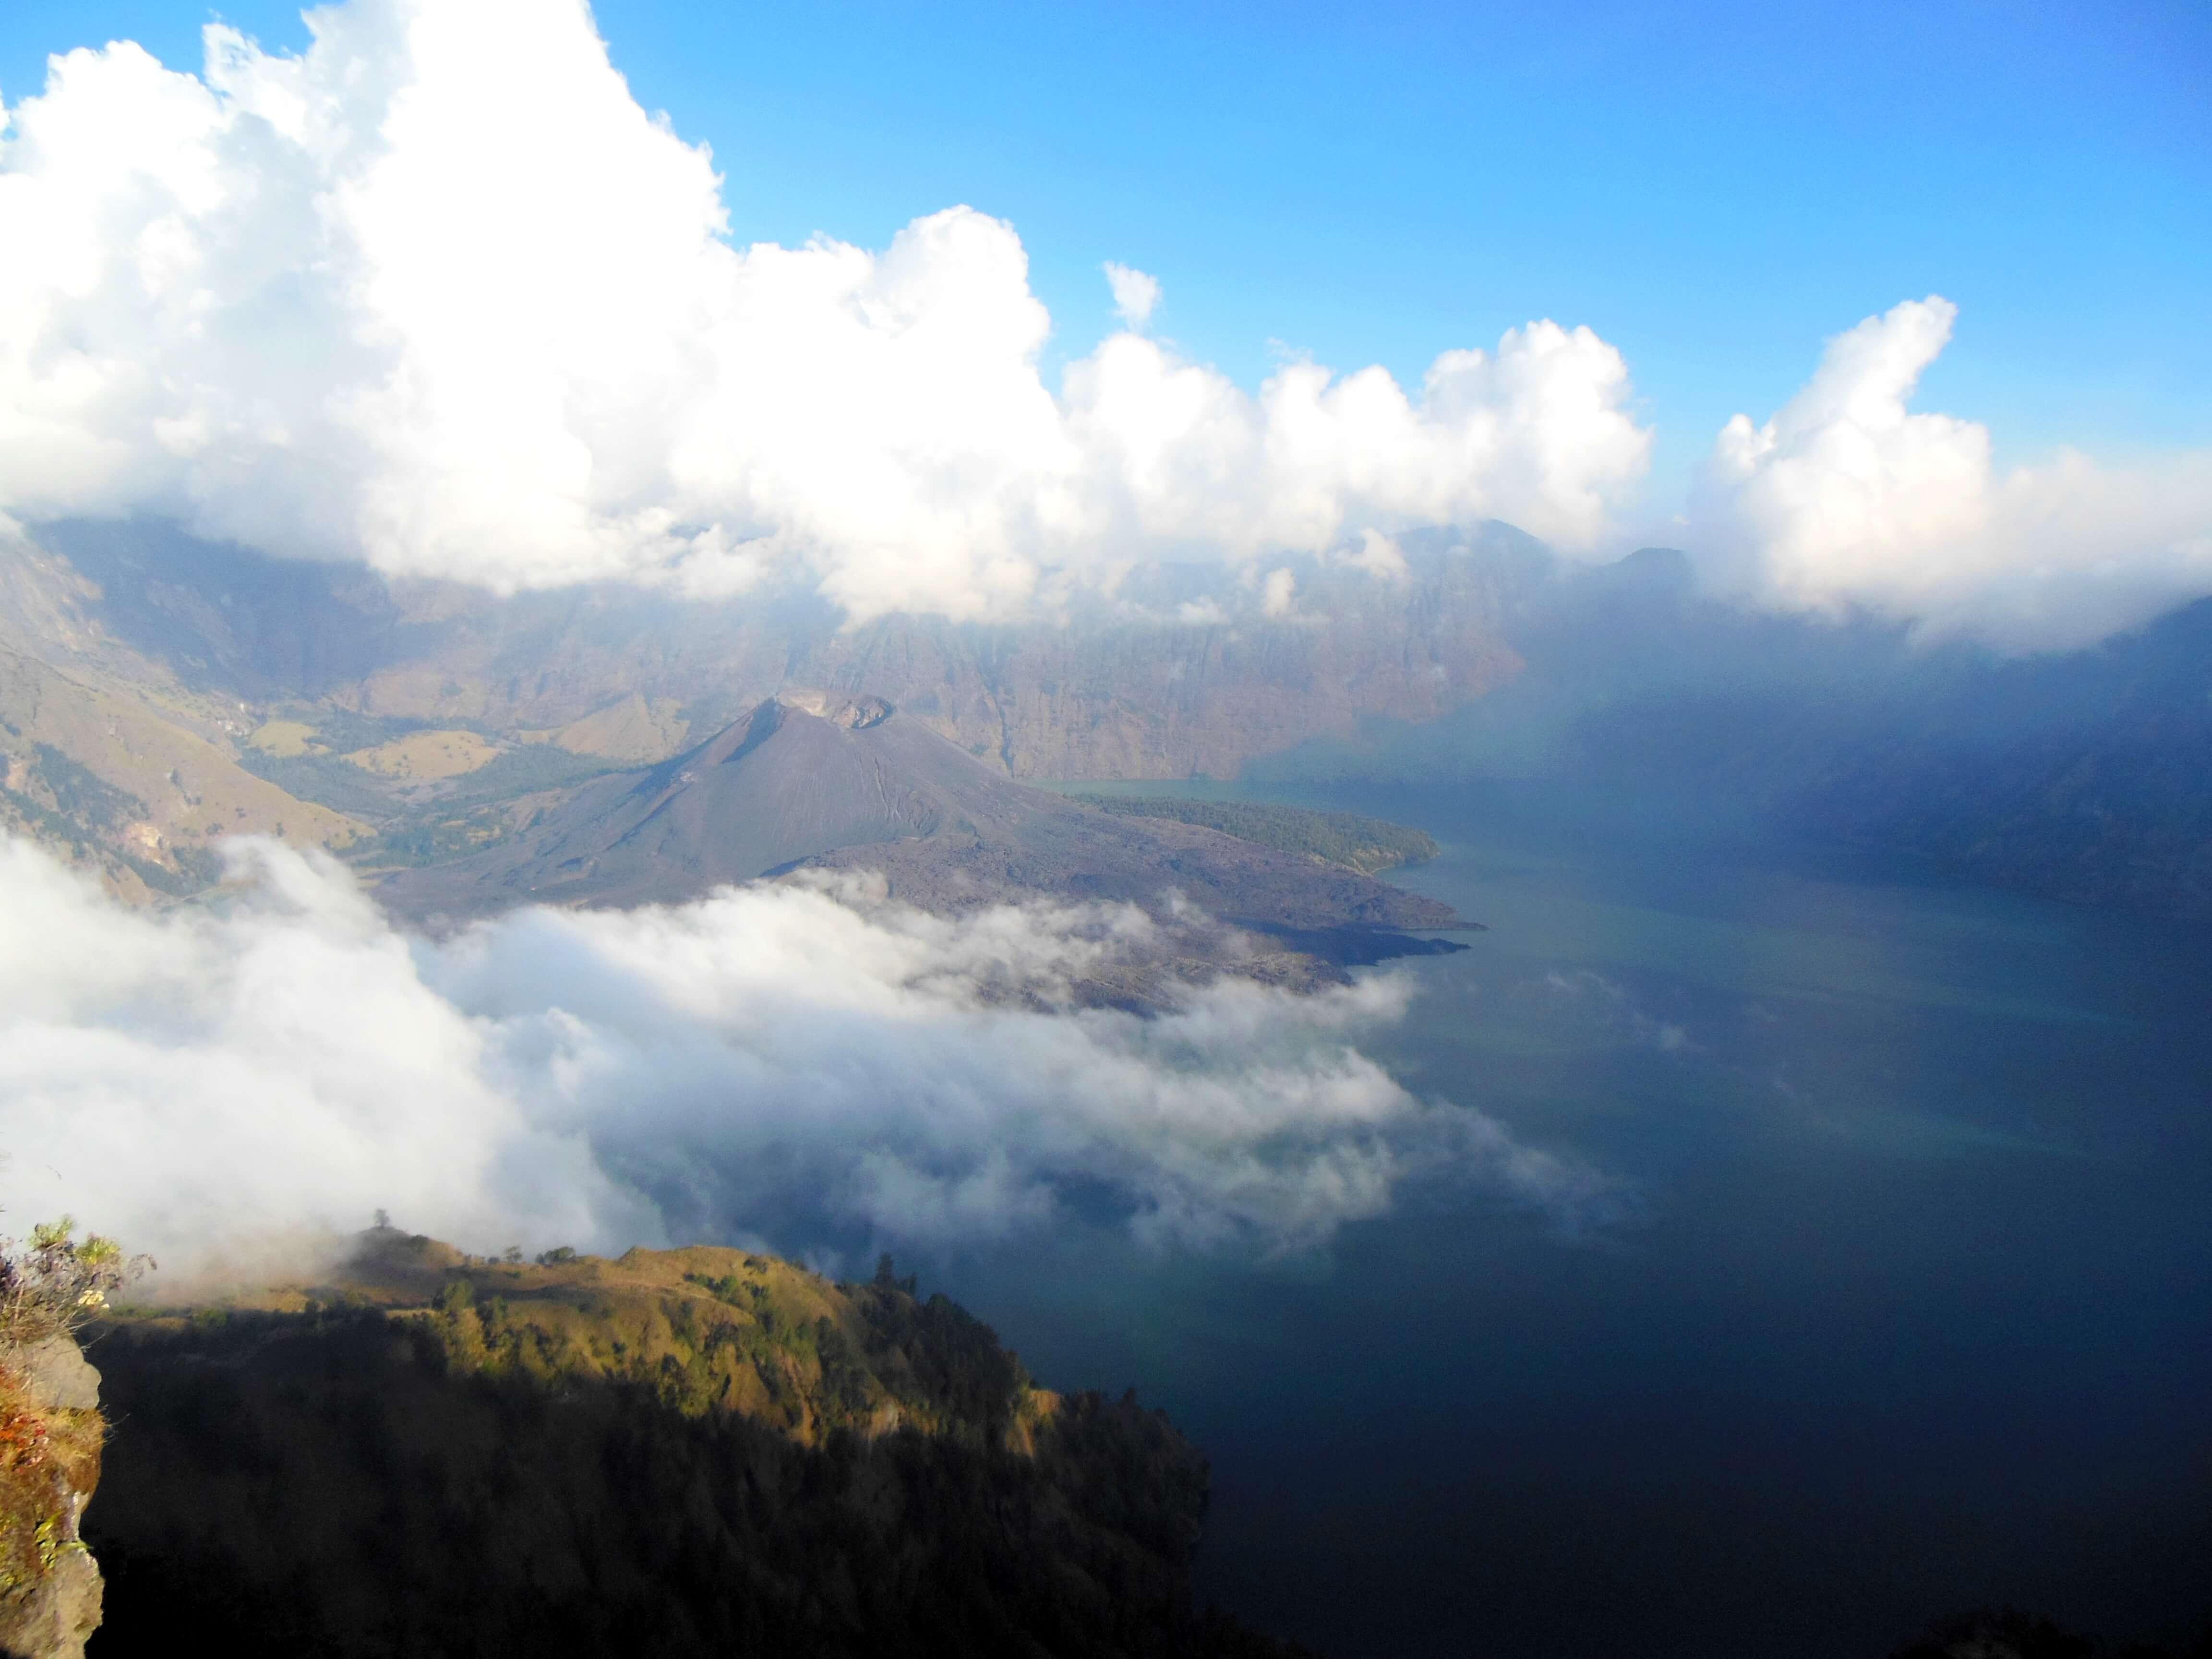 Blick in den Krater des Vulkans